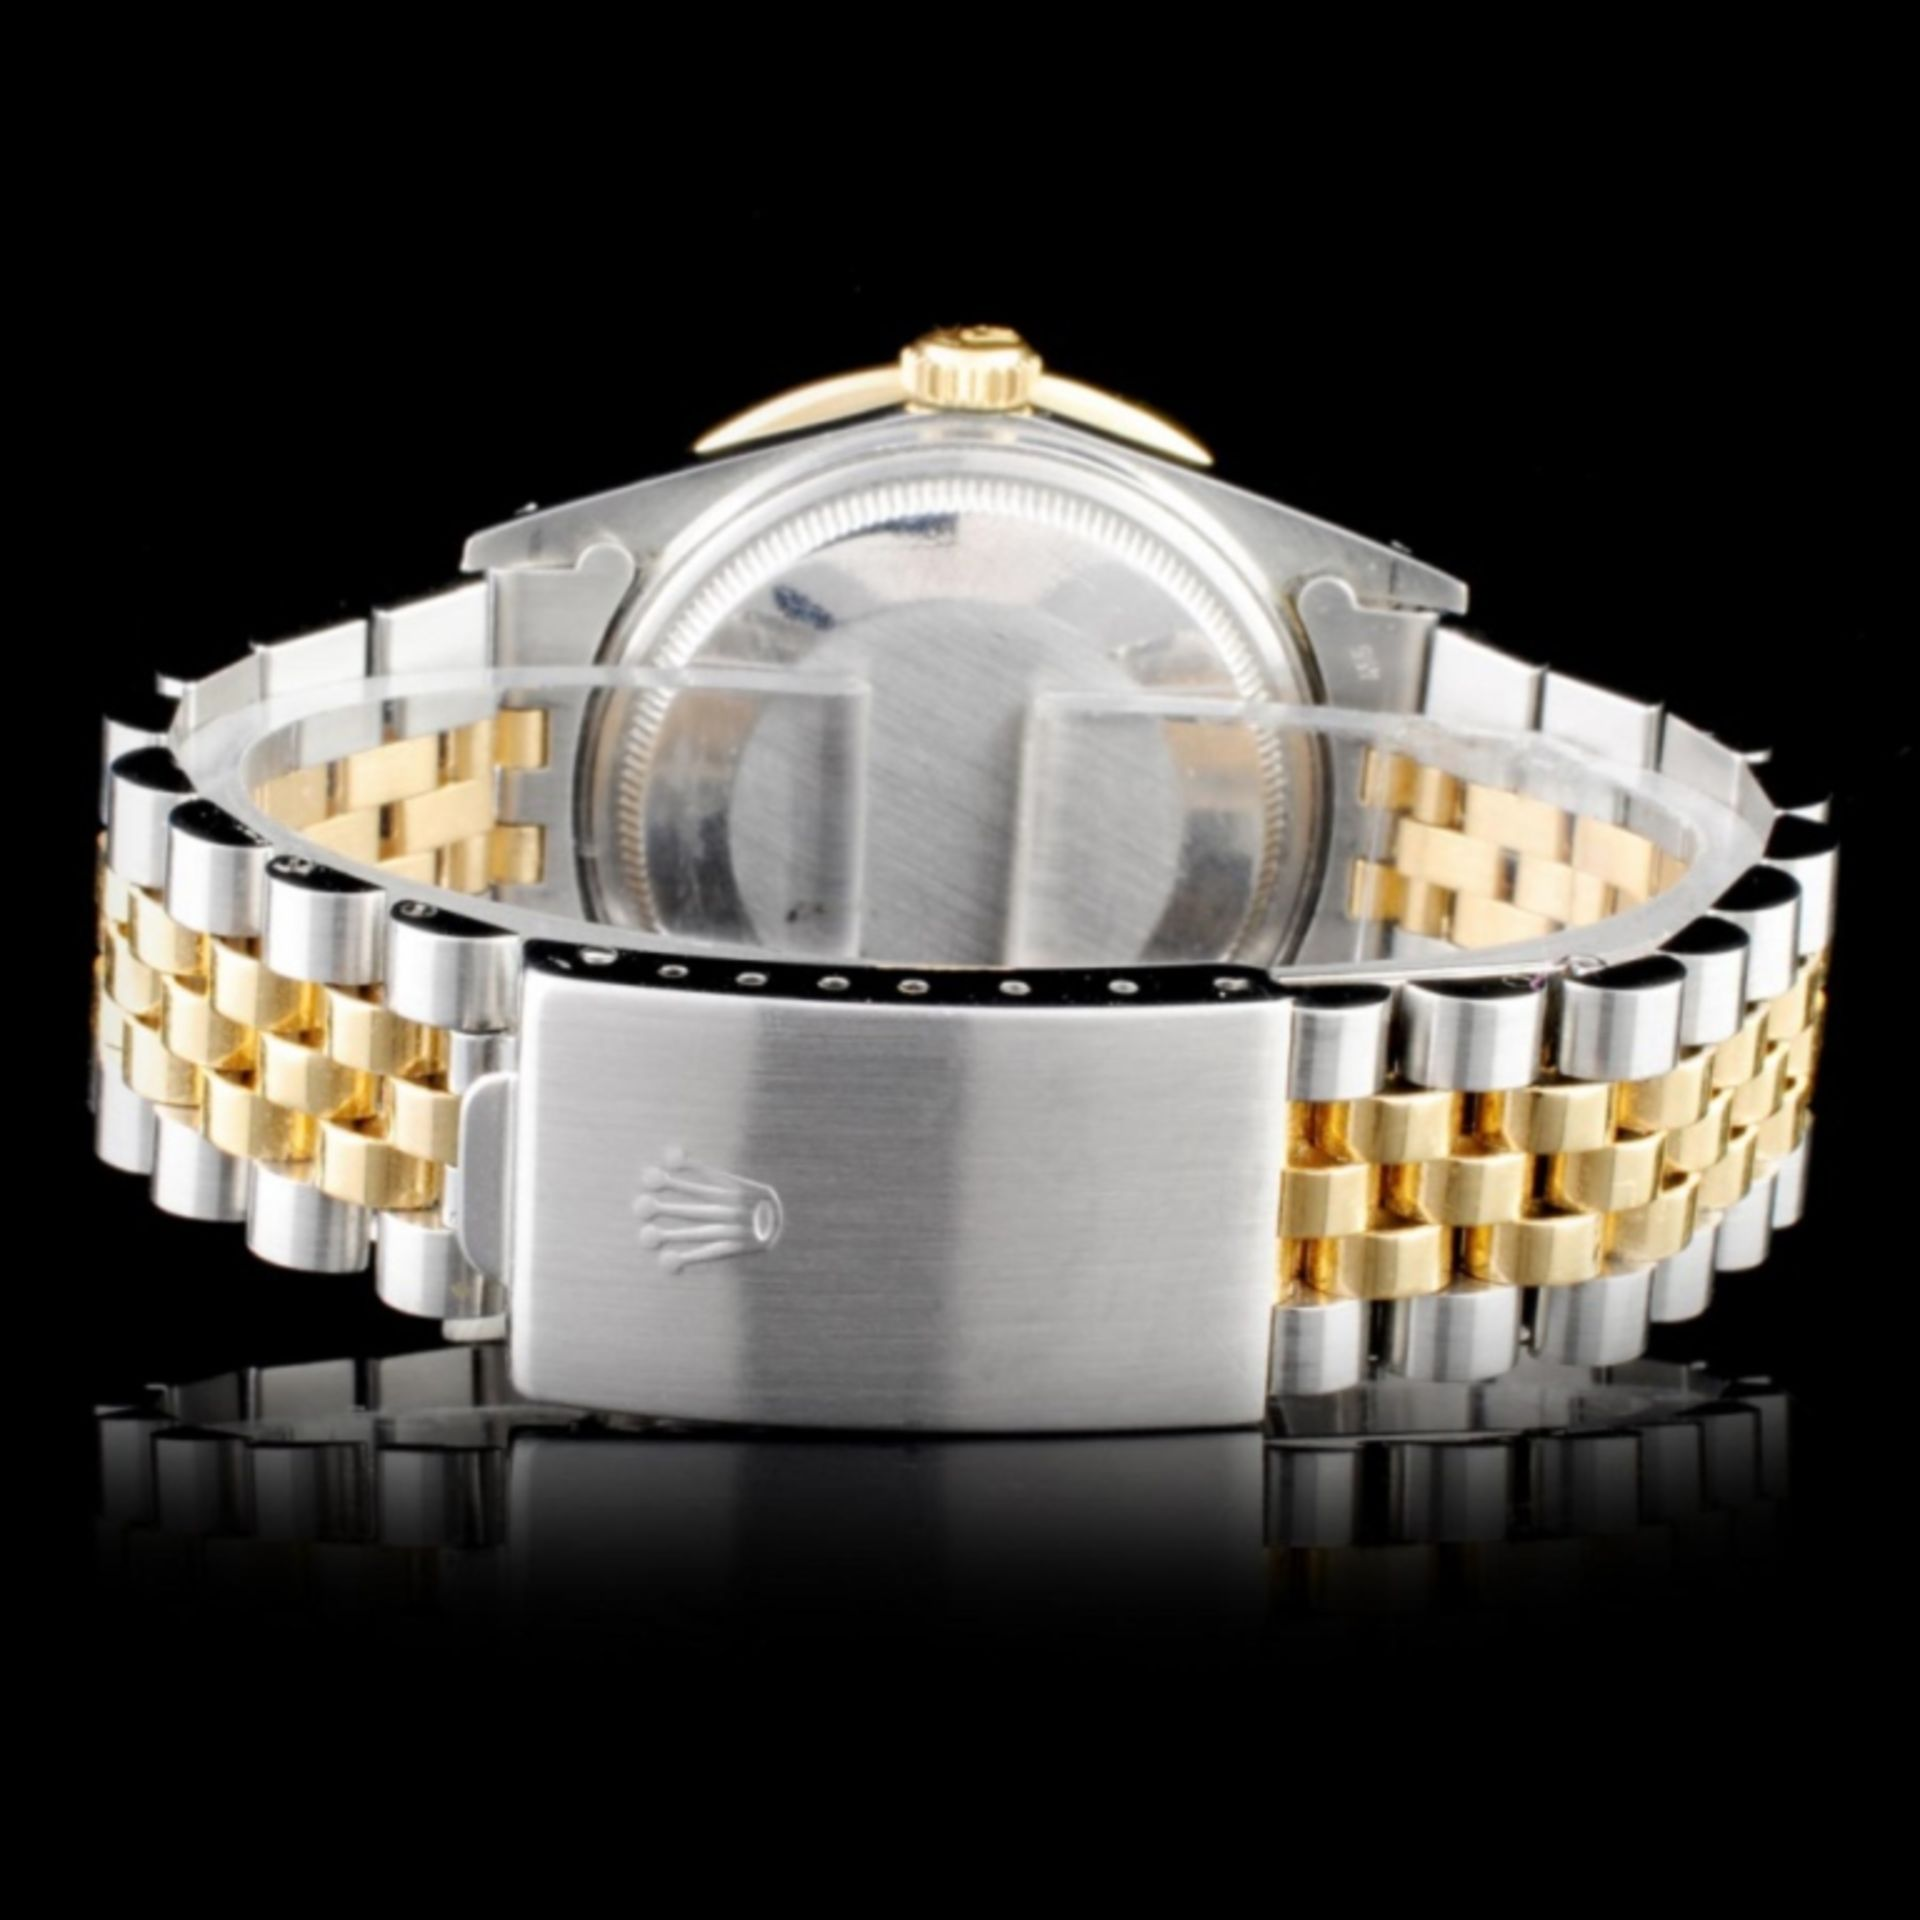 Rolex YG/SS 36MM DateJust Diamond Wristwatch - Image 3 of 5